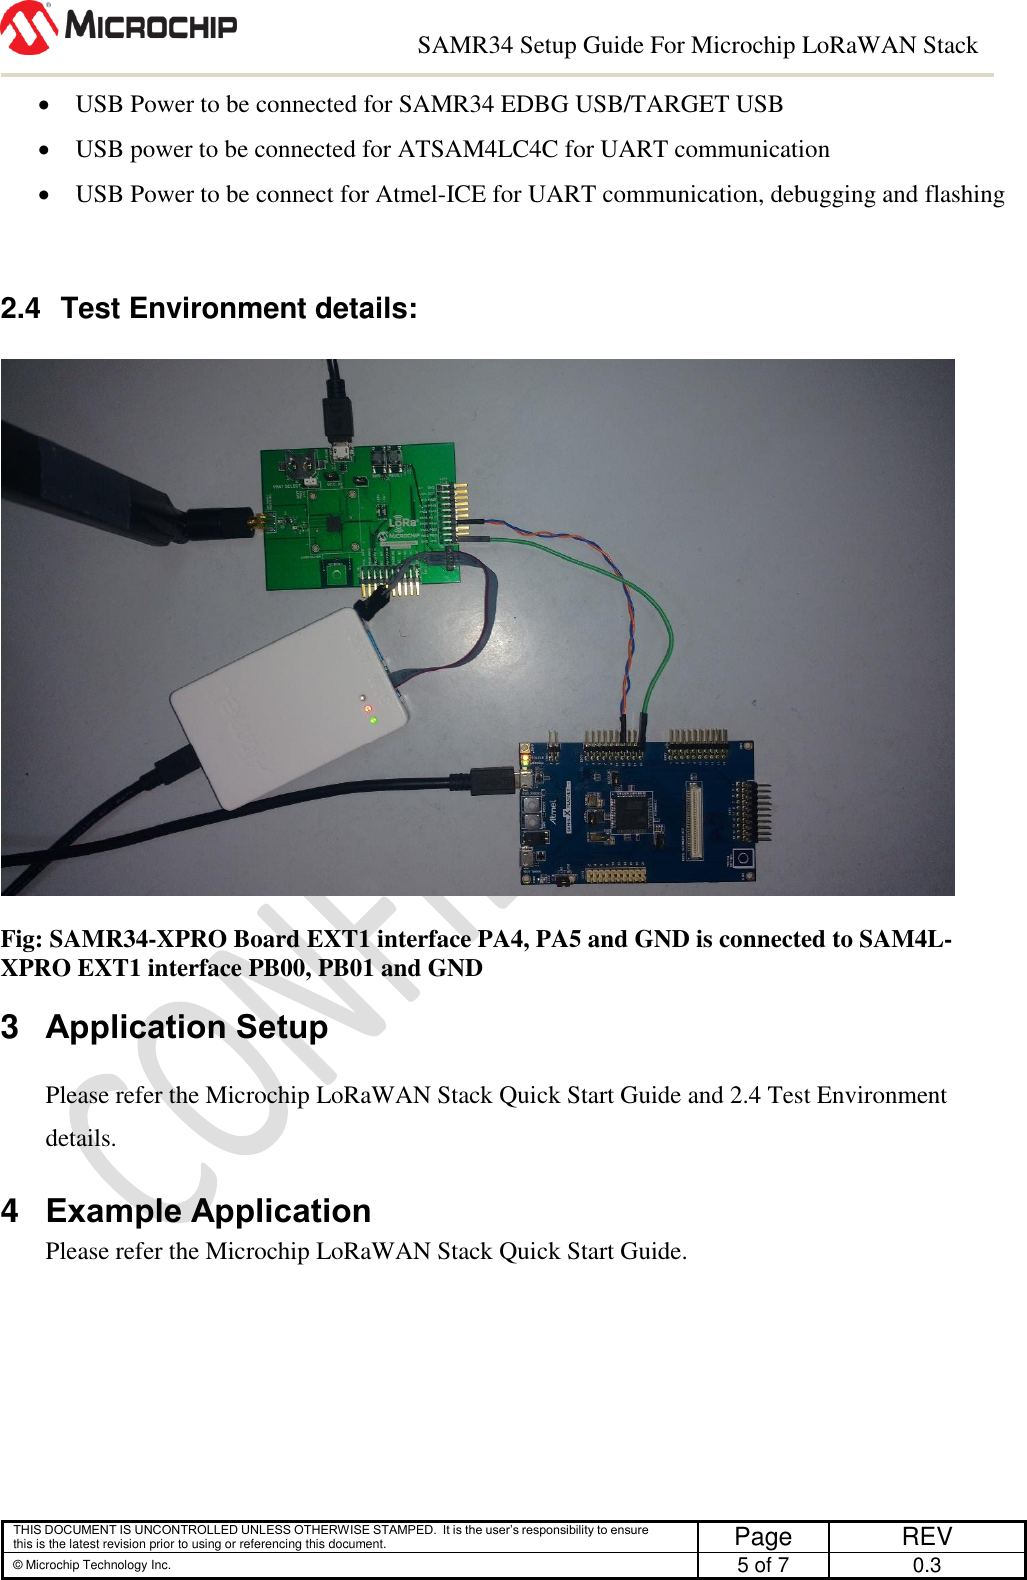 SAMR34 Setup Guide For Microchip Lo Ra WAN Stack